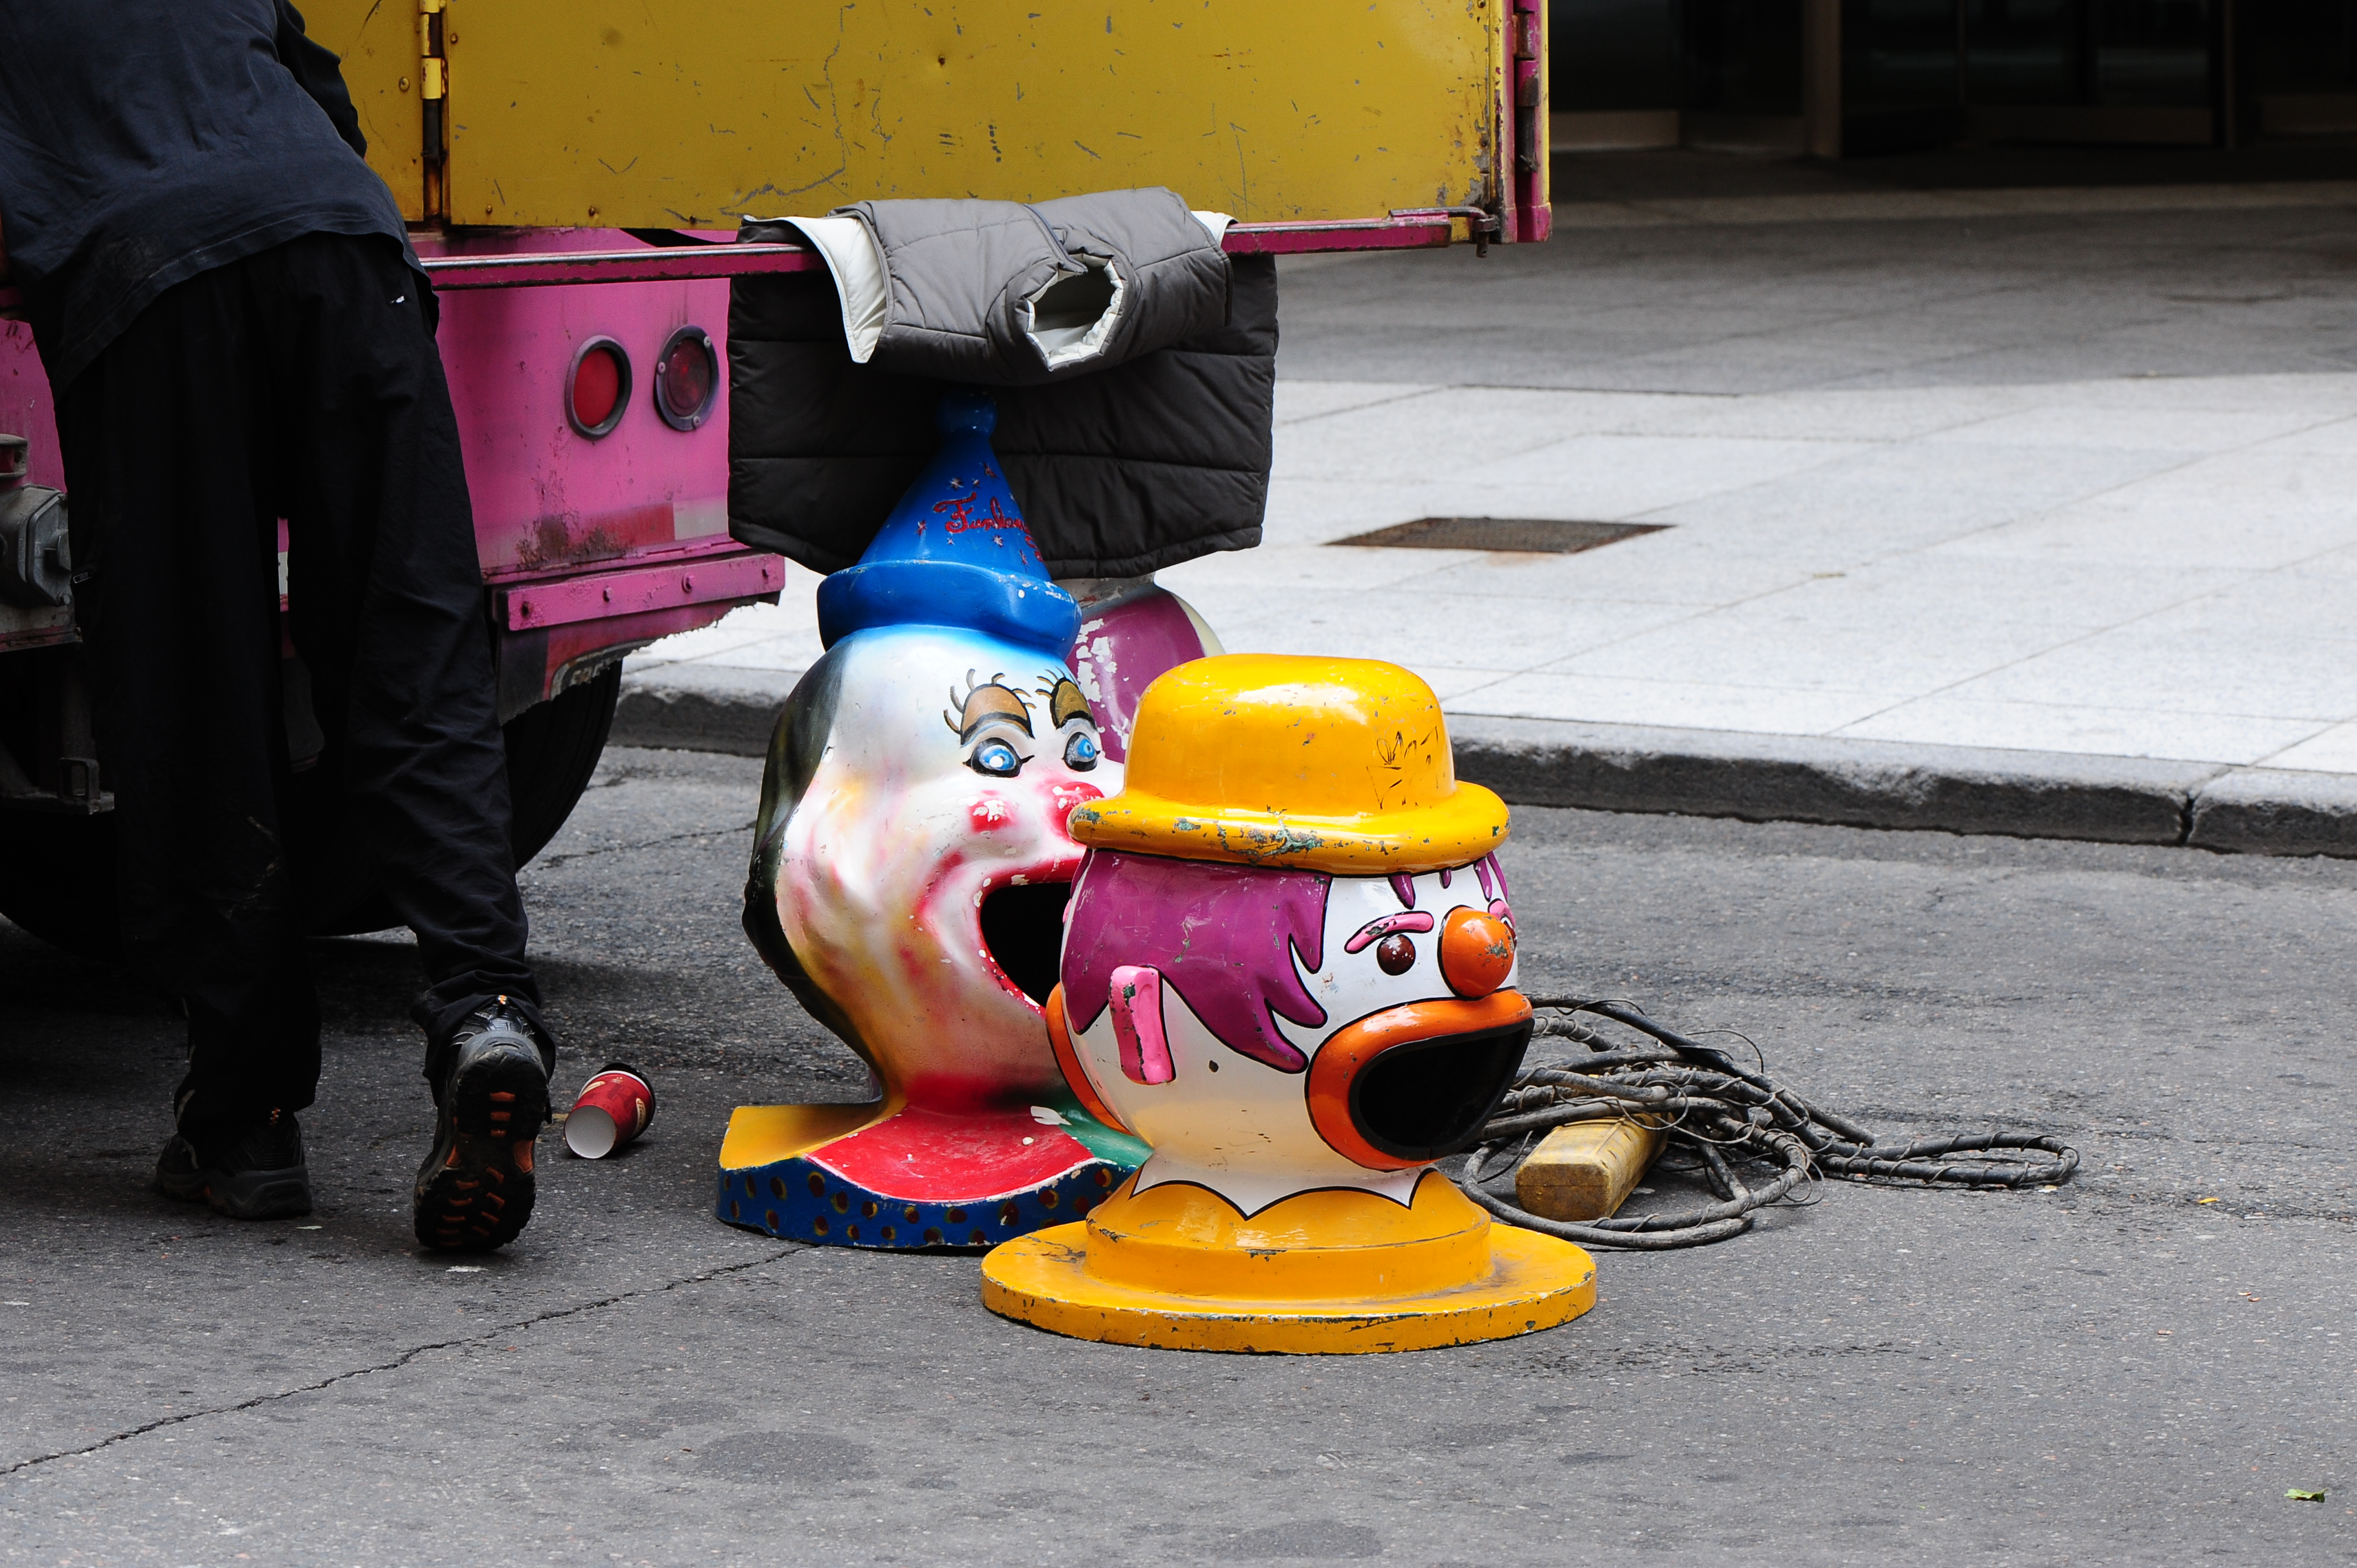 wild ride clown head